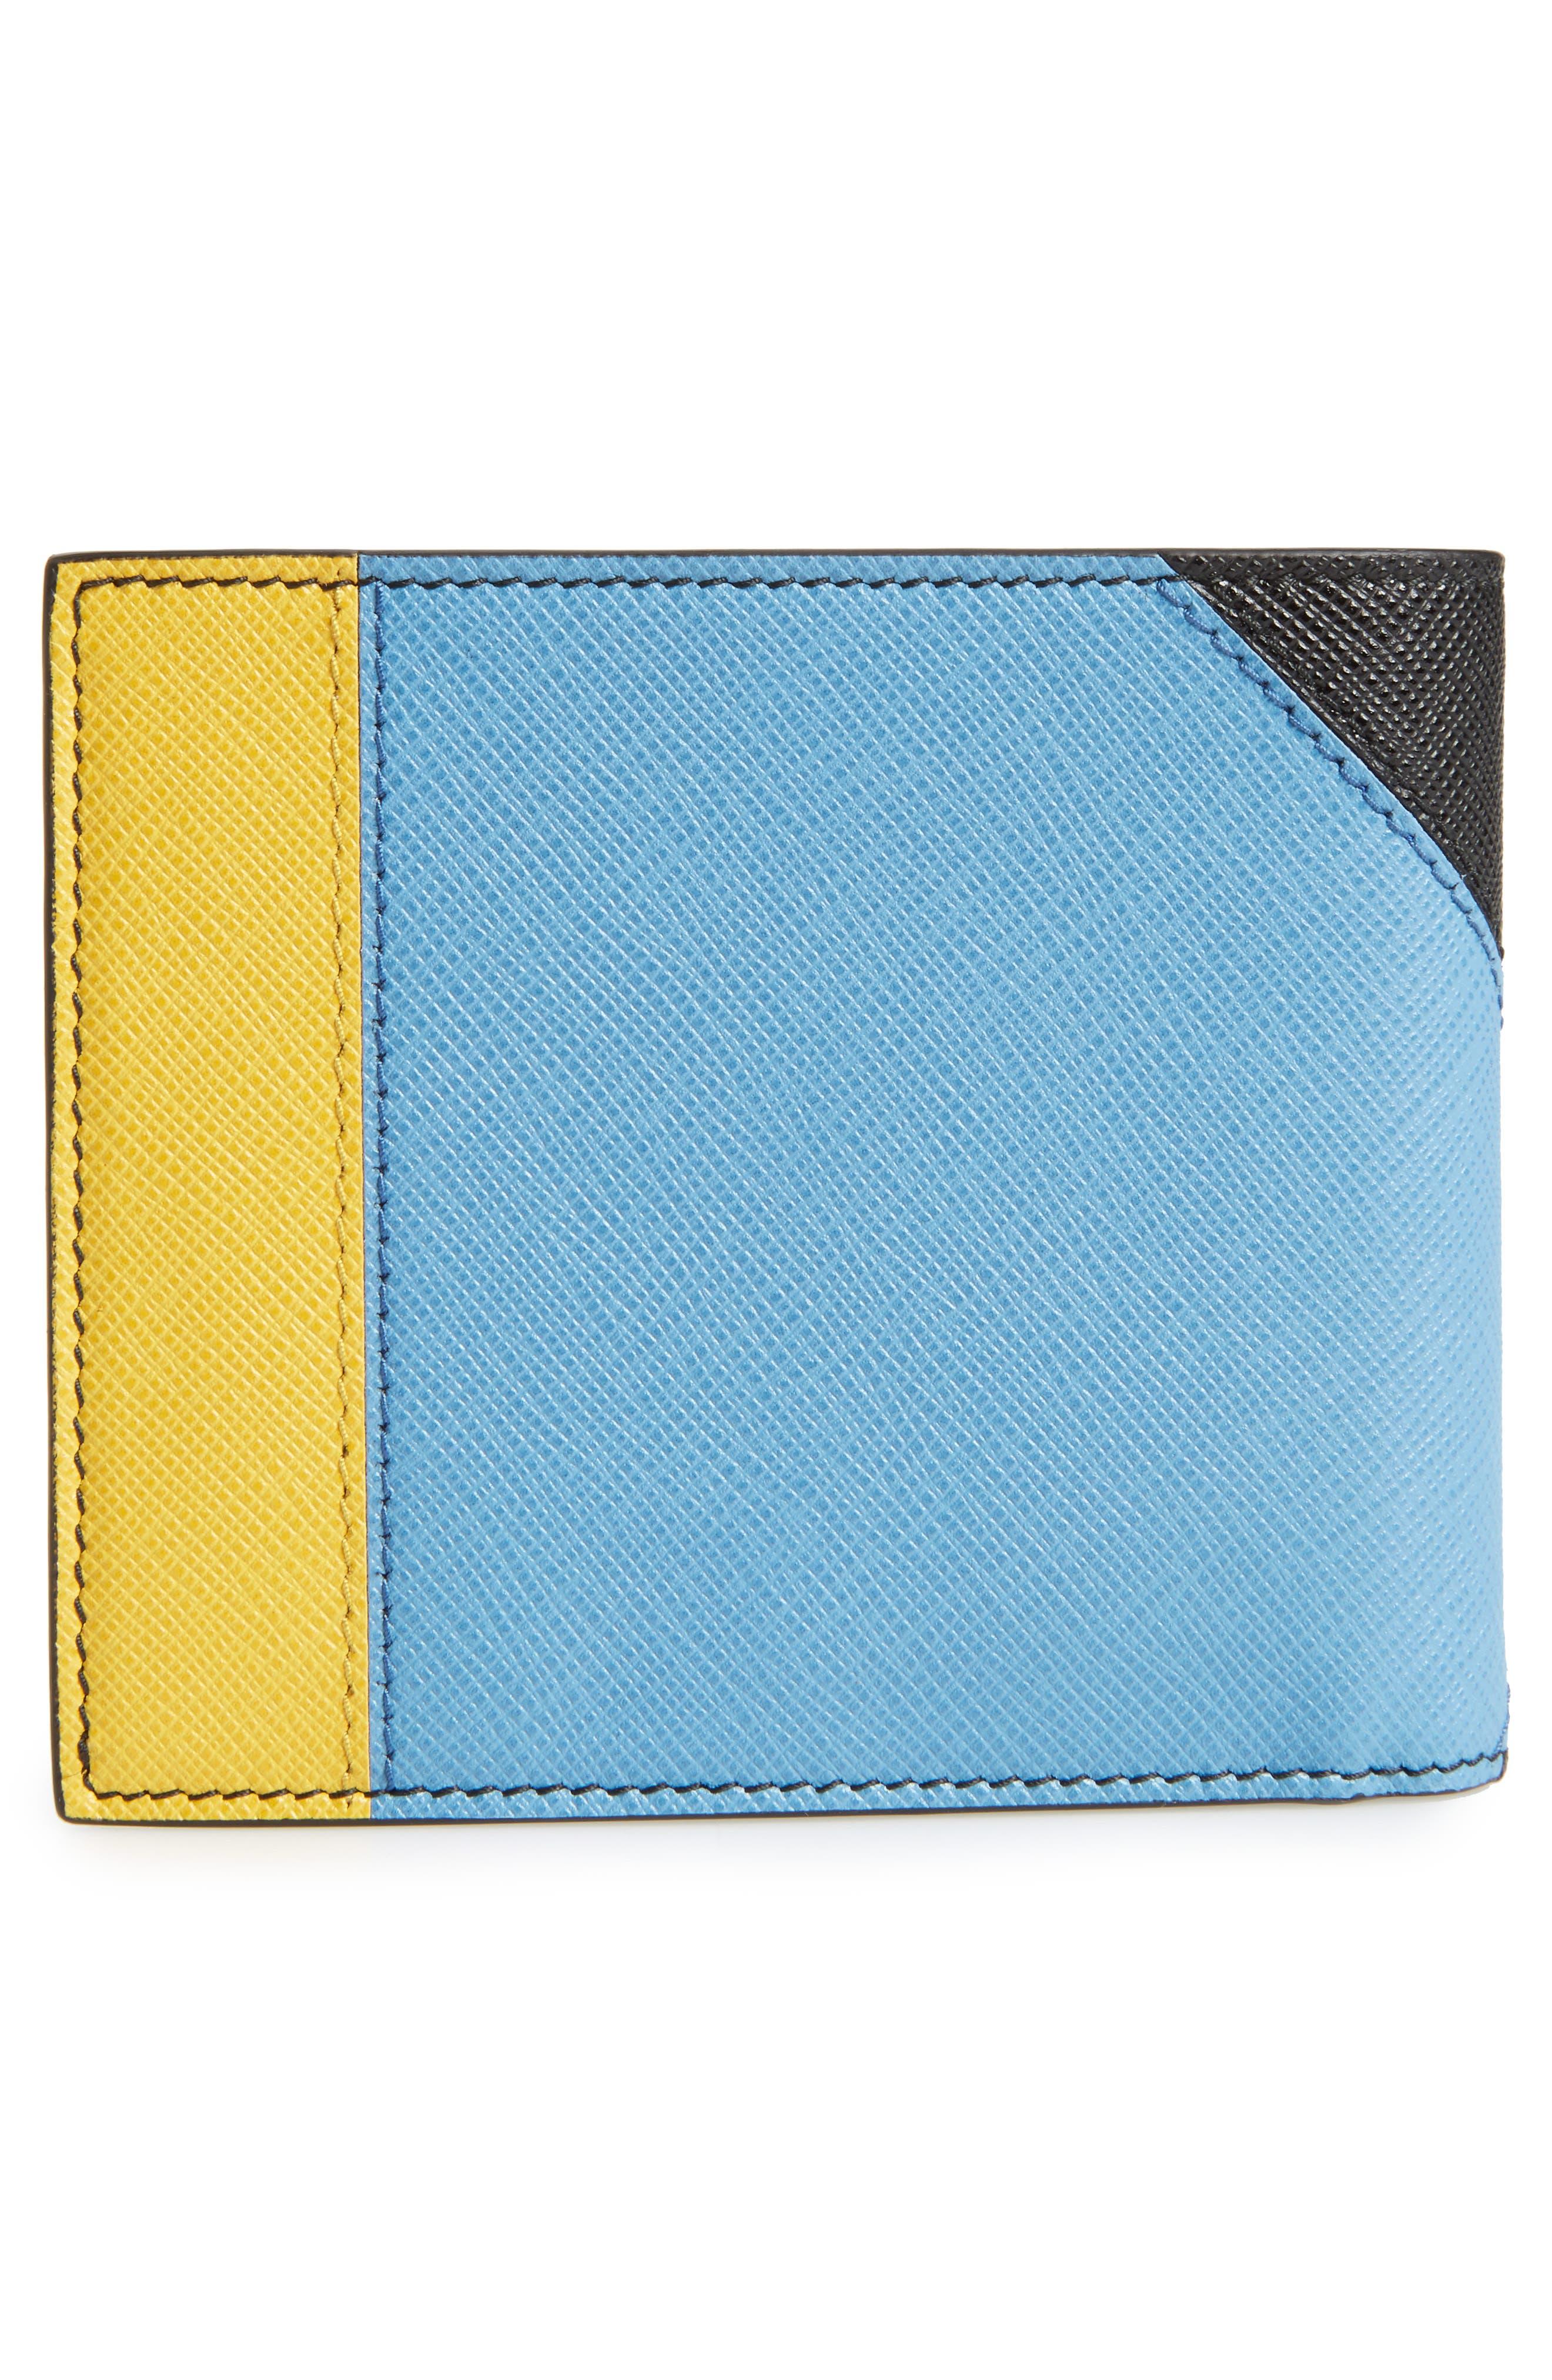 Alternate Image 3  - Prada Arrow Calfskin Leather Wallet